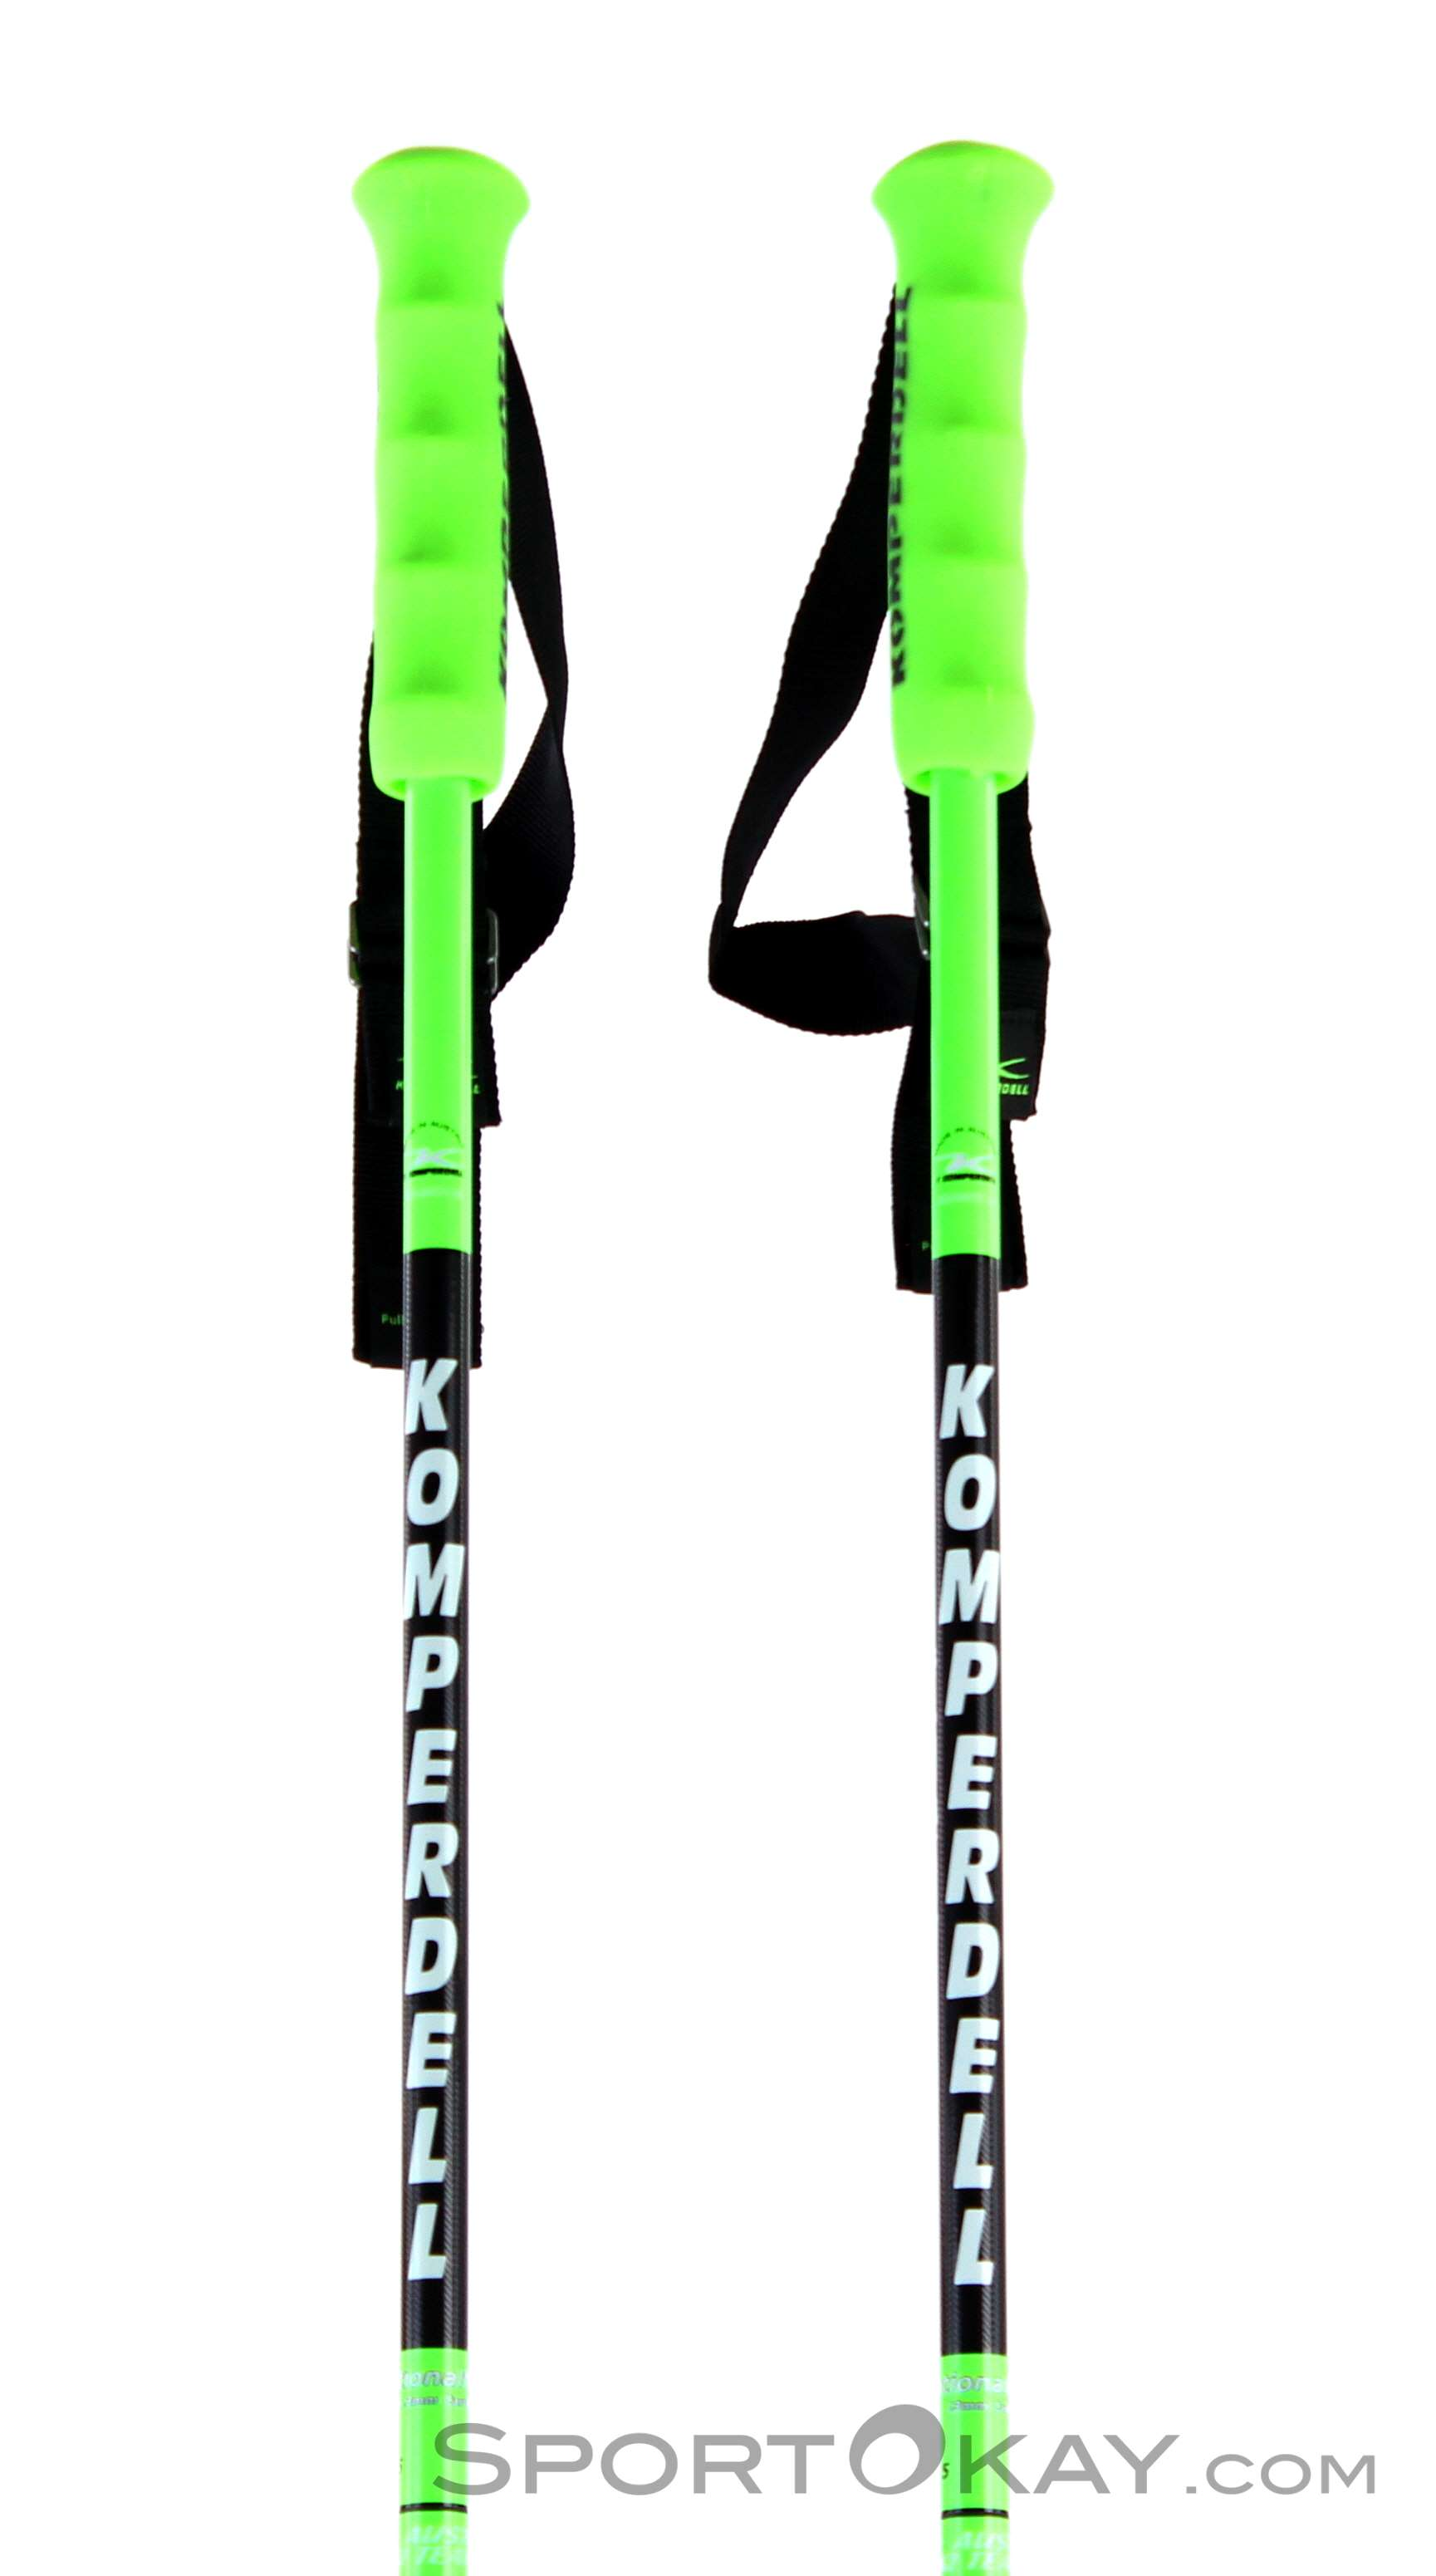 Komperdell Nationalteam Carbon Skistöcke-Grün-115